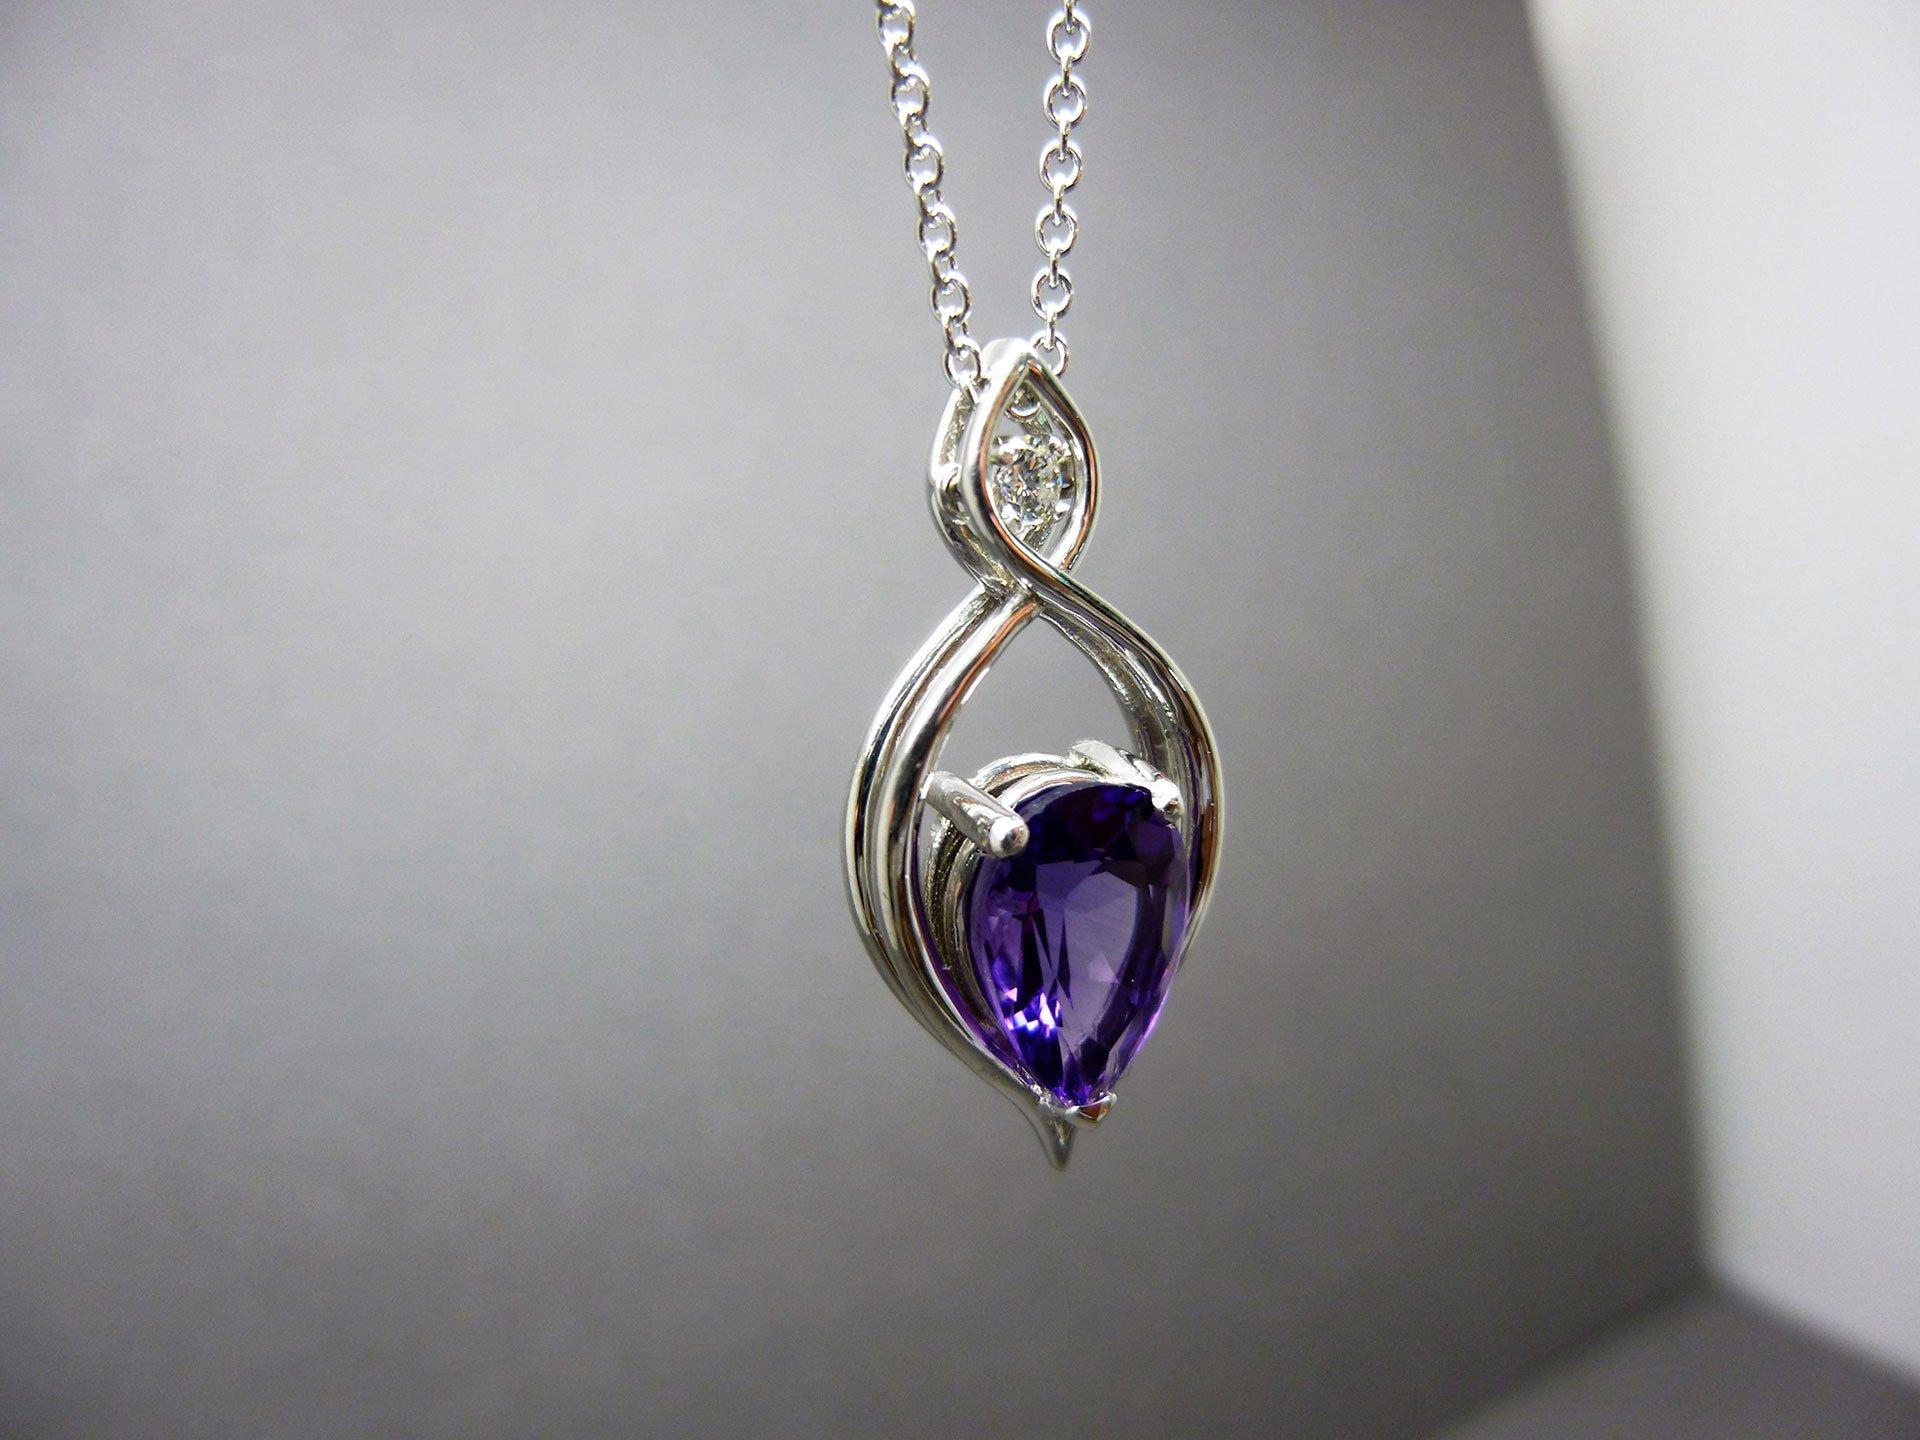 An amethyst and diamond pendant close up